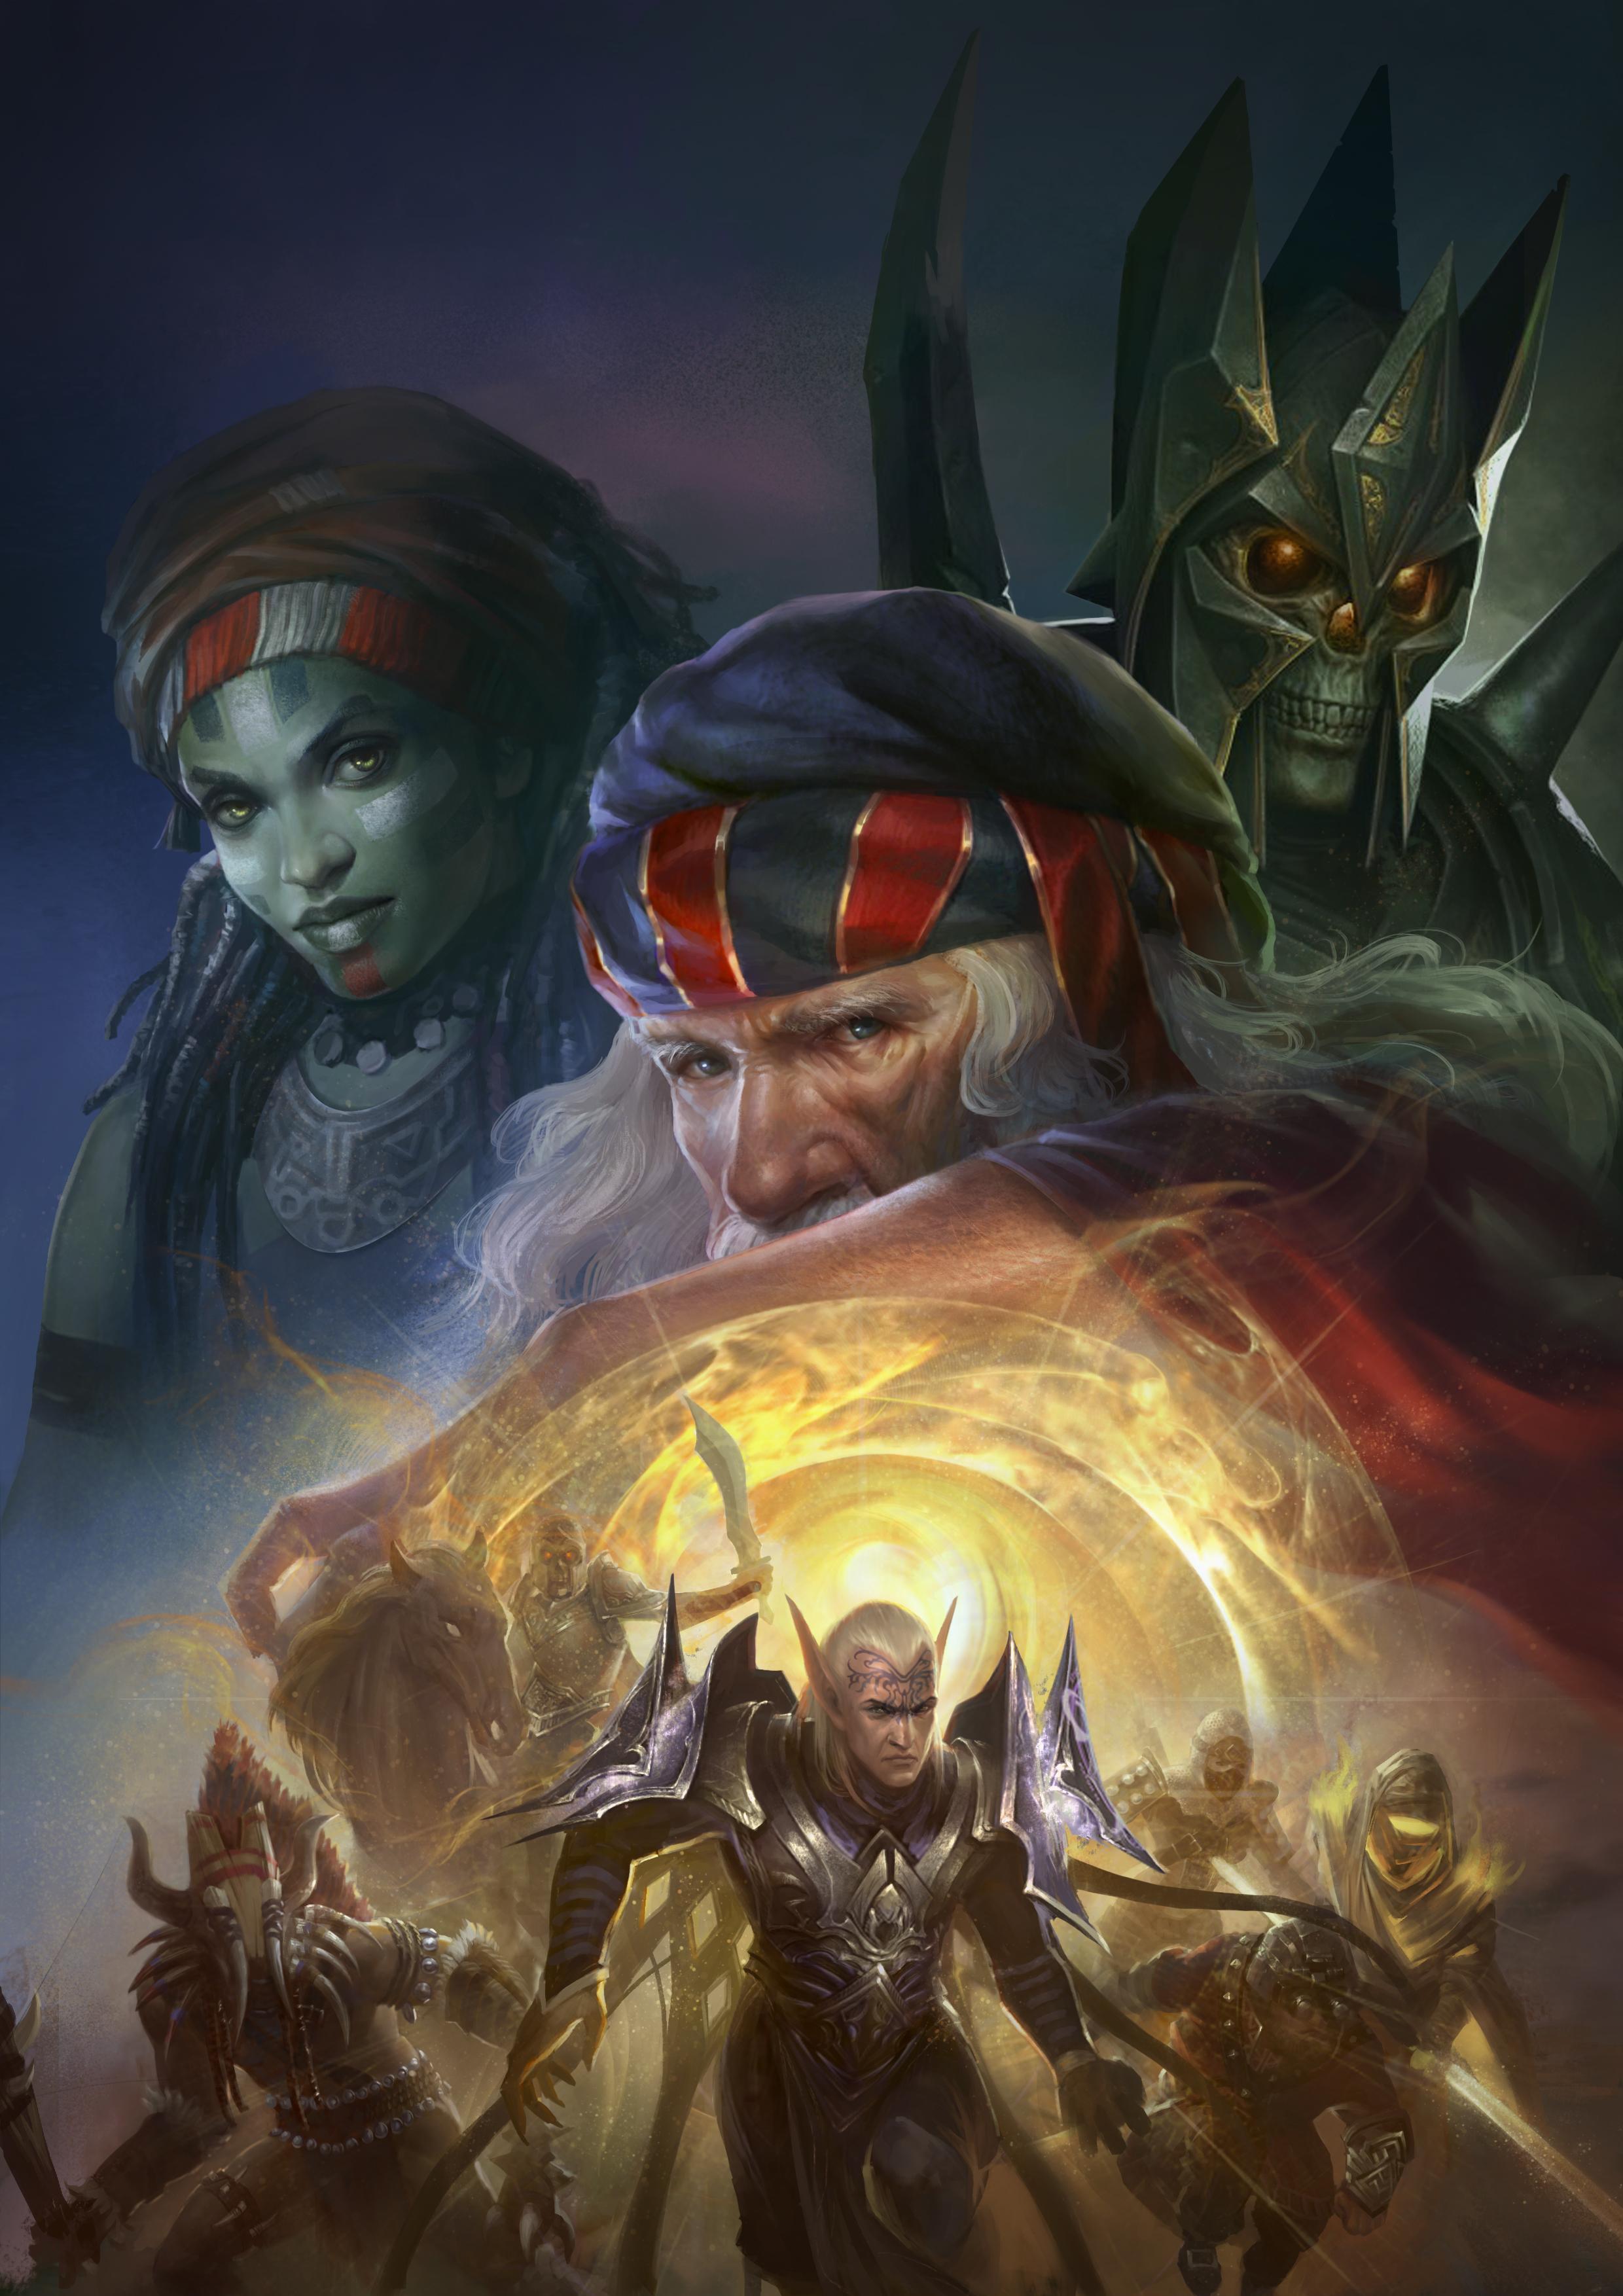 warlock_2_final_v2